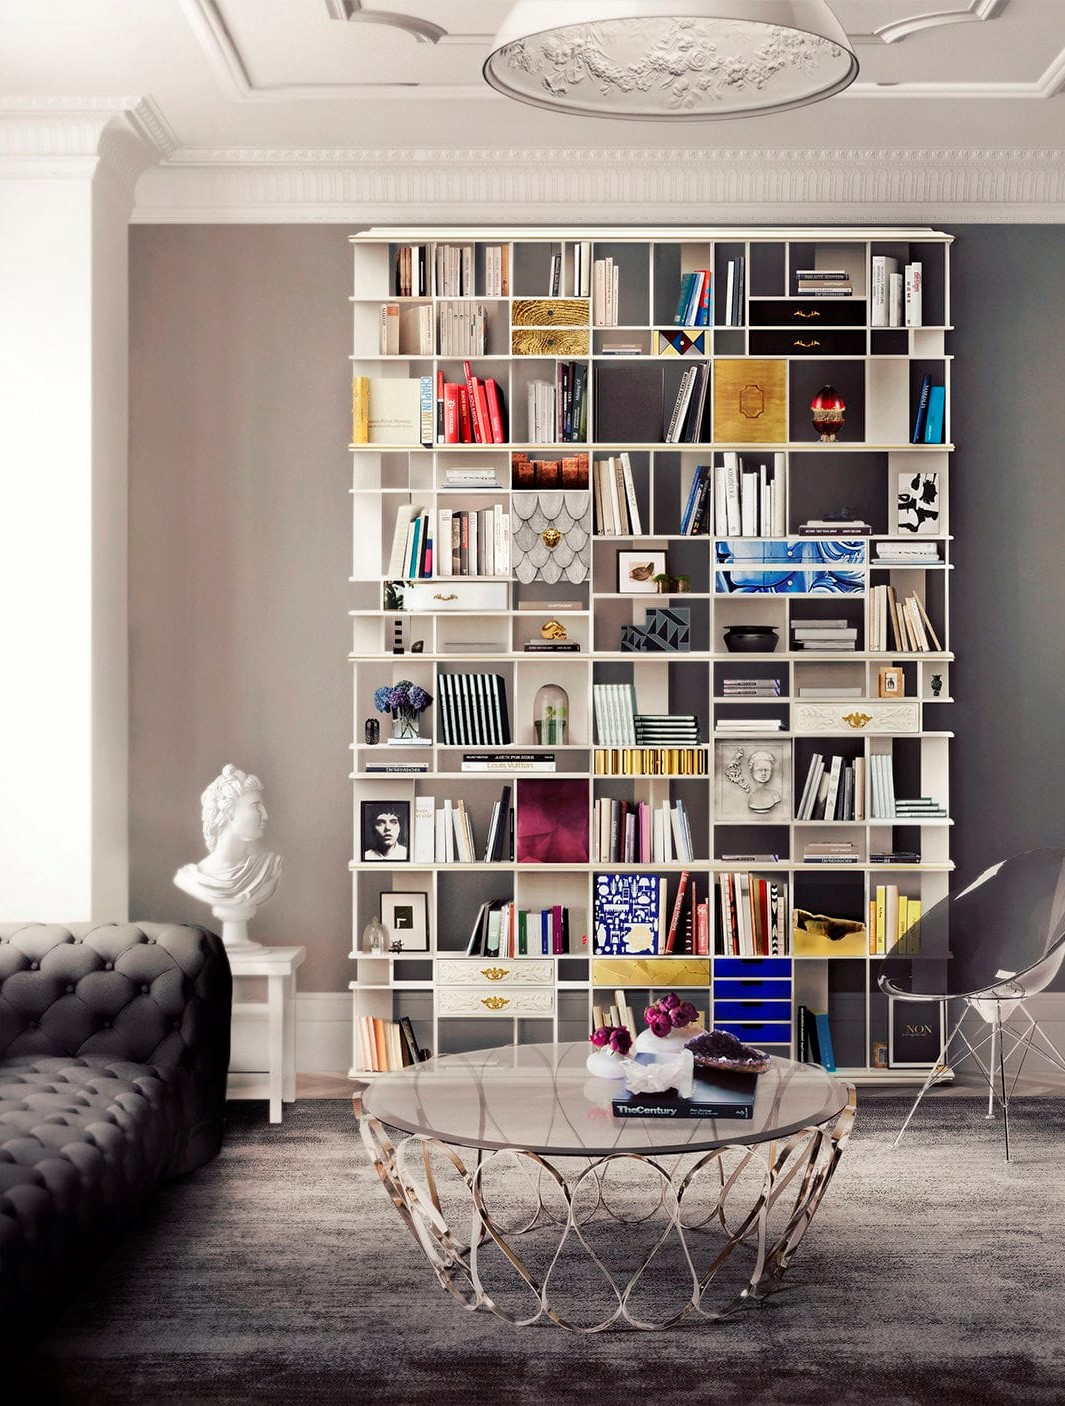 Design News: Boca do Lobo at Maison et Objet Paris 2017